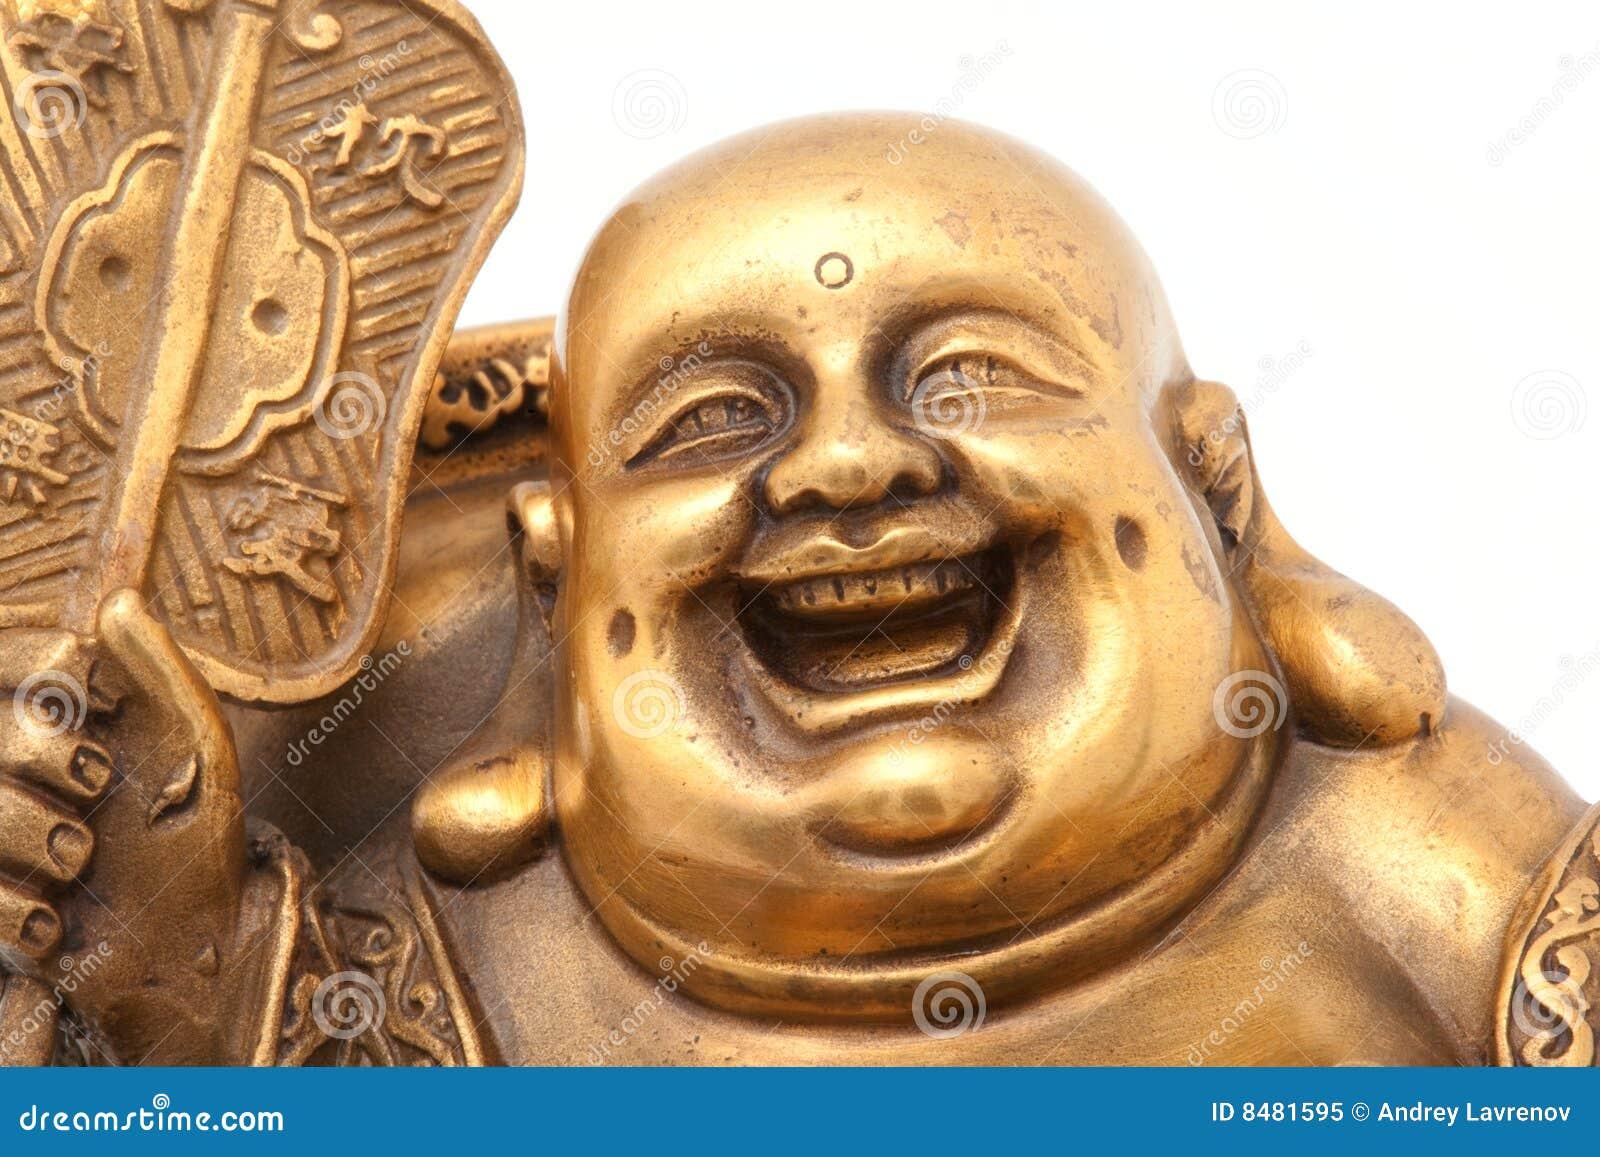 Cheerful Golden Hotei. Close-up